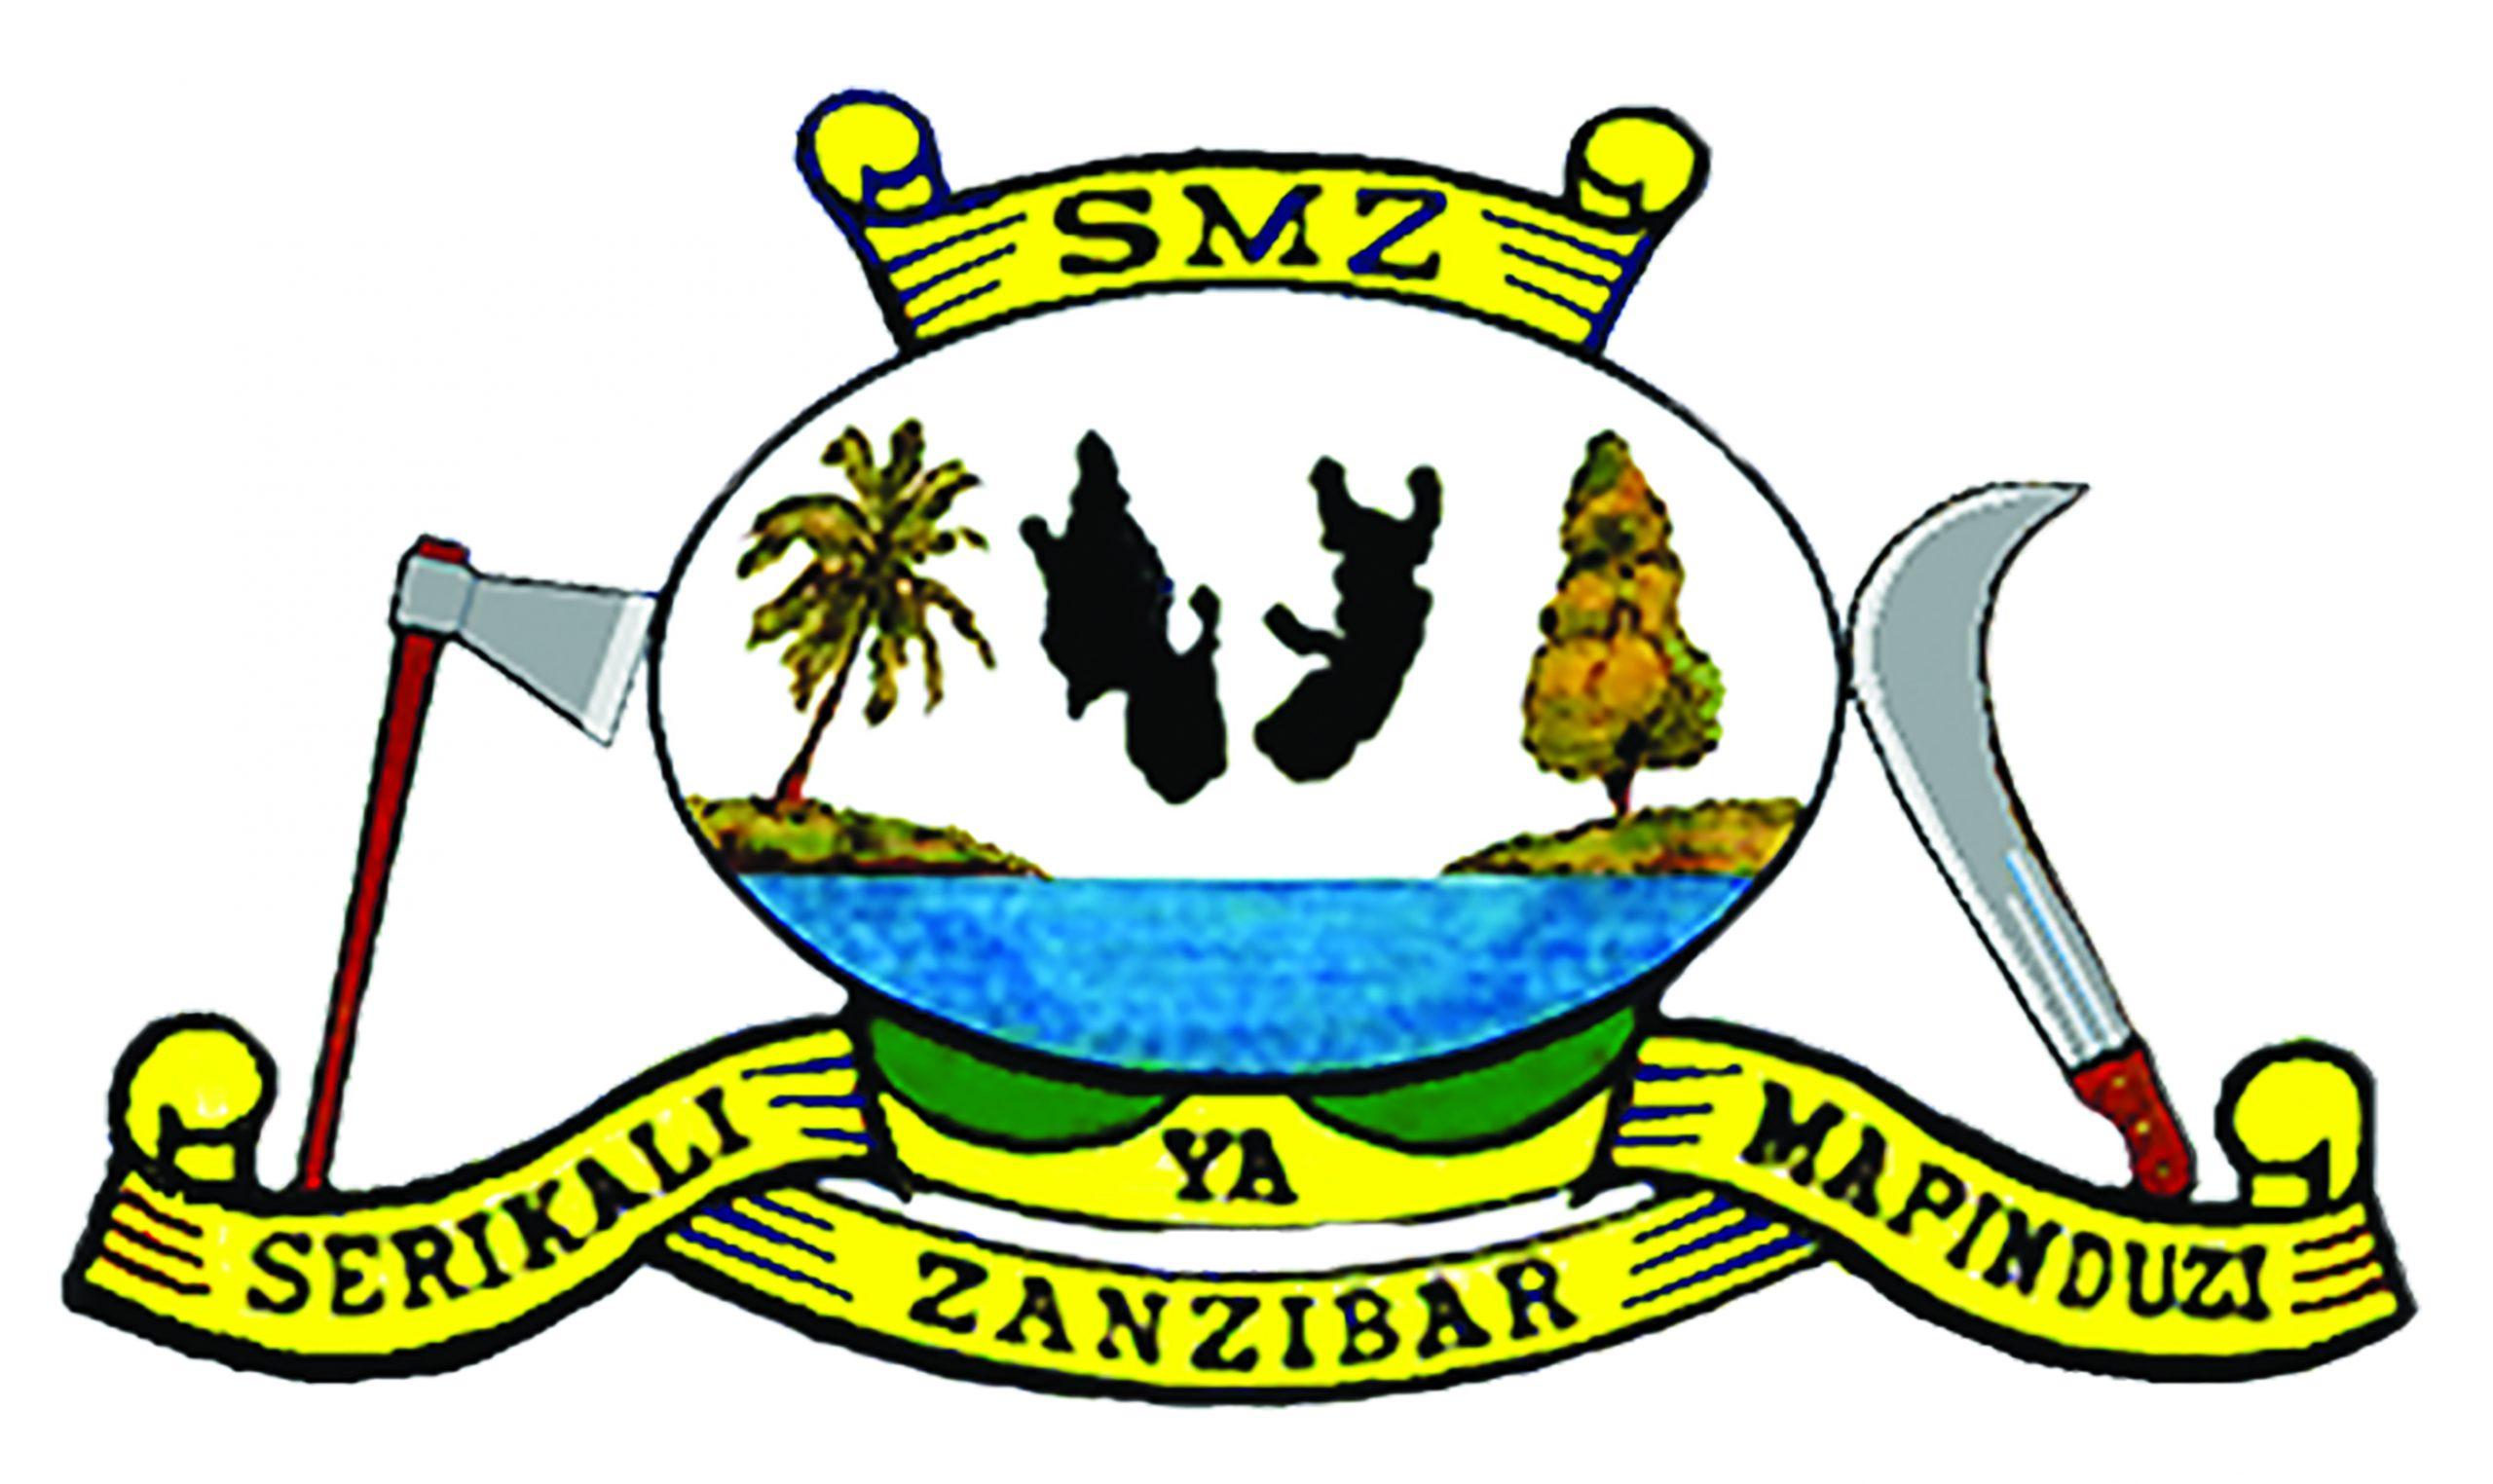 Ministry of Health, Social Welfare, Elderly, Gender and Children Zanzibar